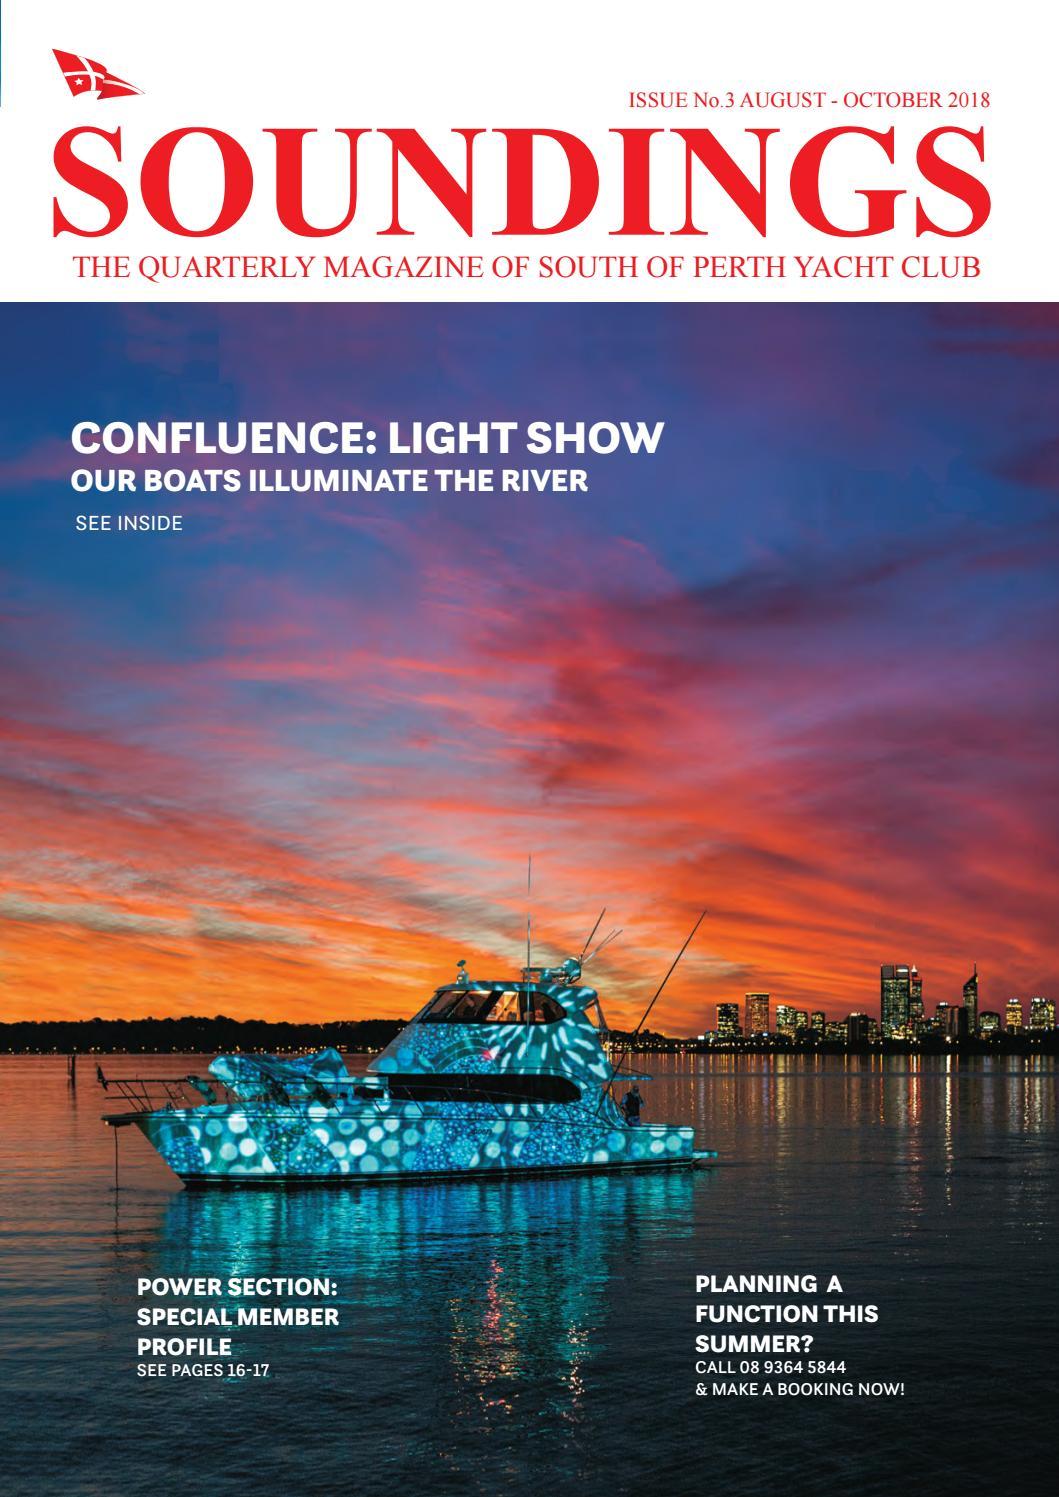 Sound of Perth Yacht Club Soundings Magazine by sopyc0 - issuu